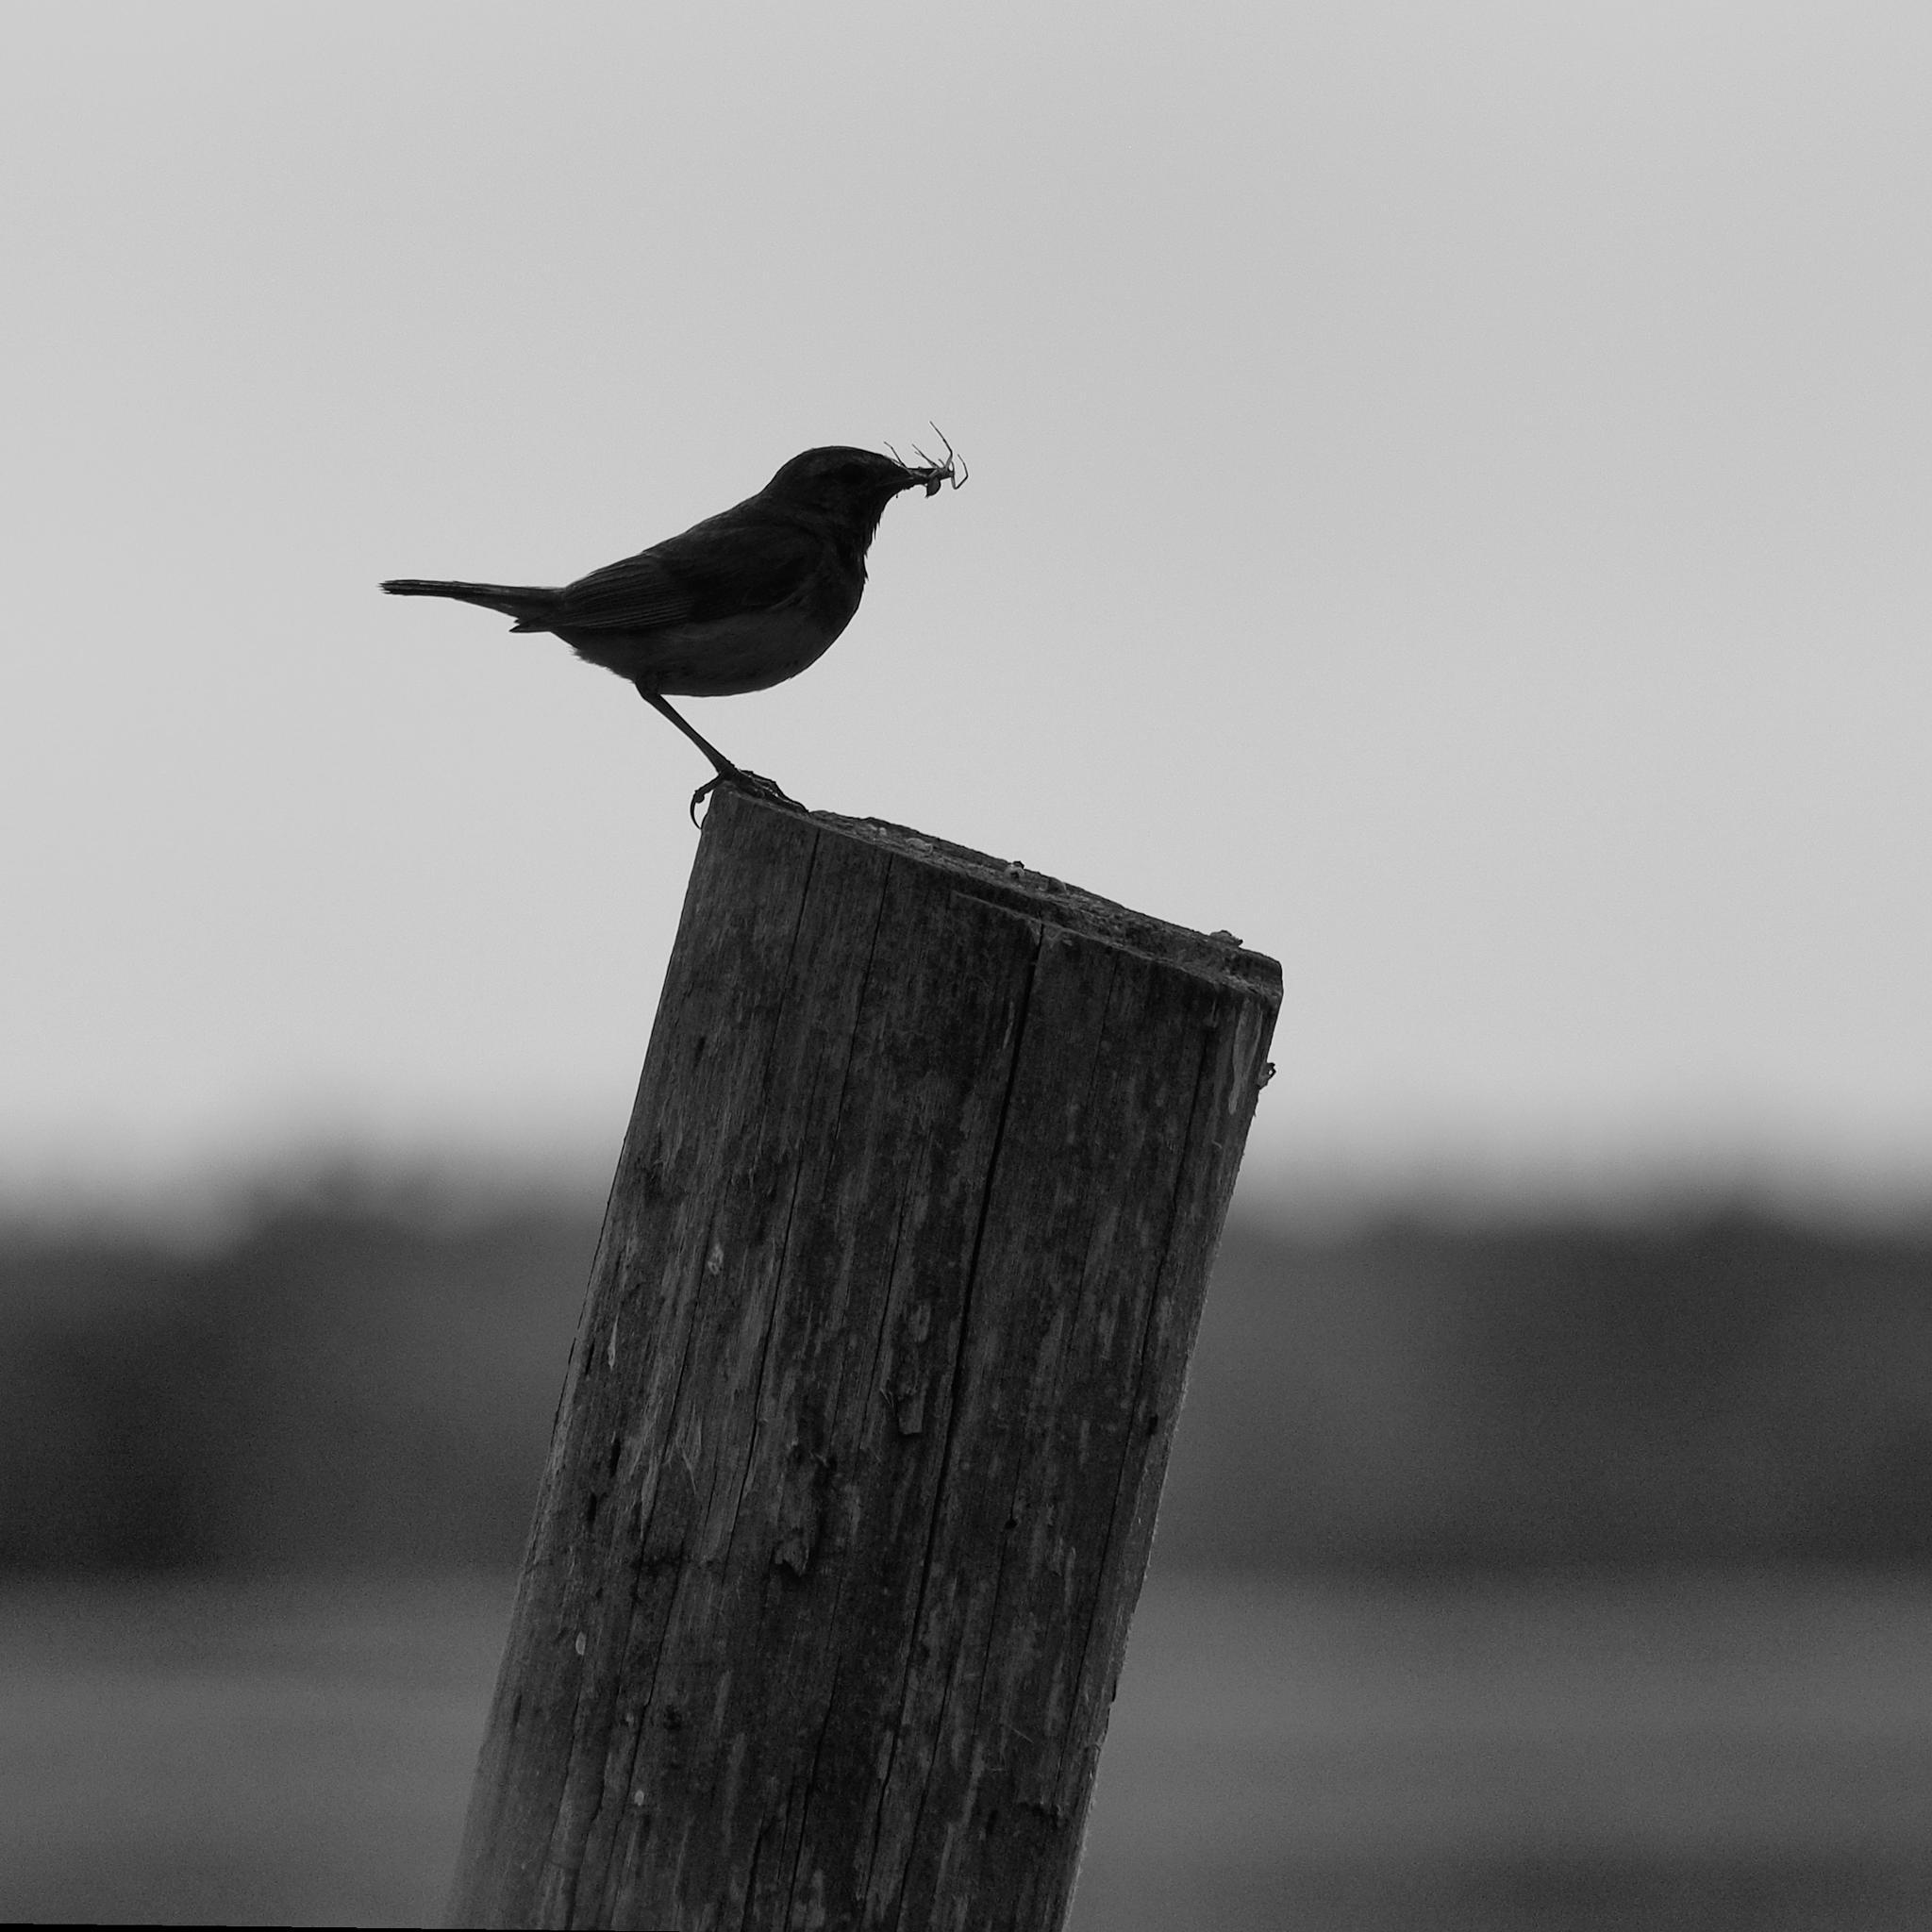 In the beak by Igor Marach